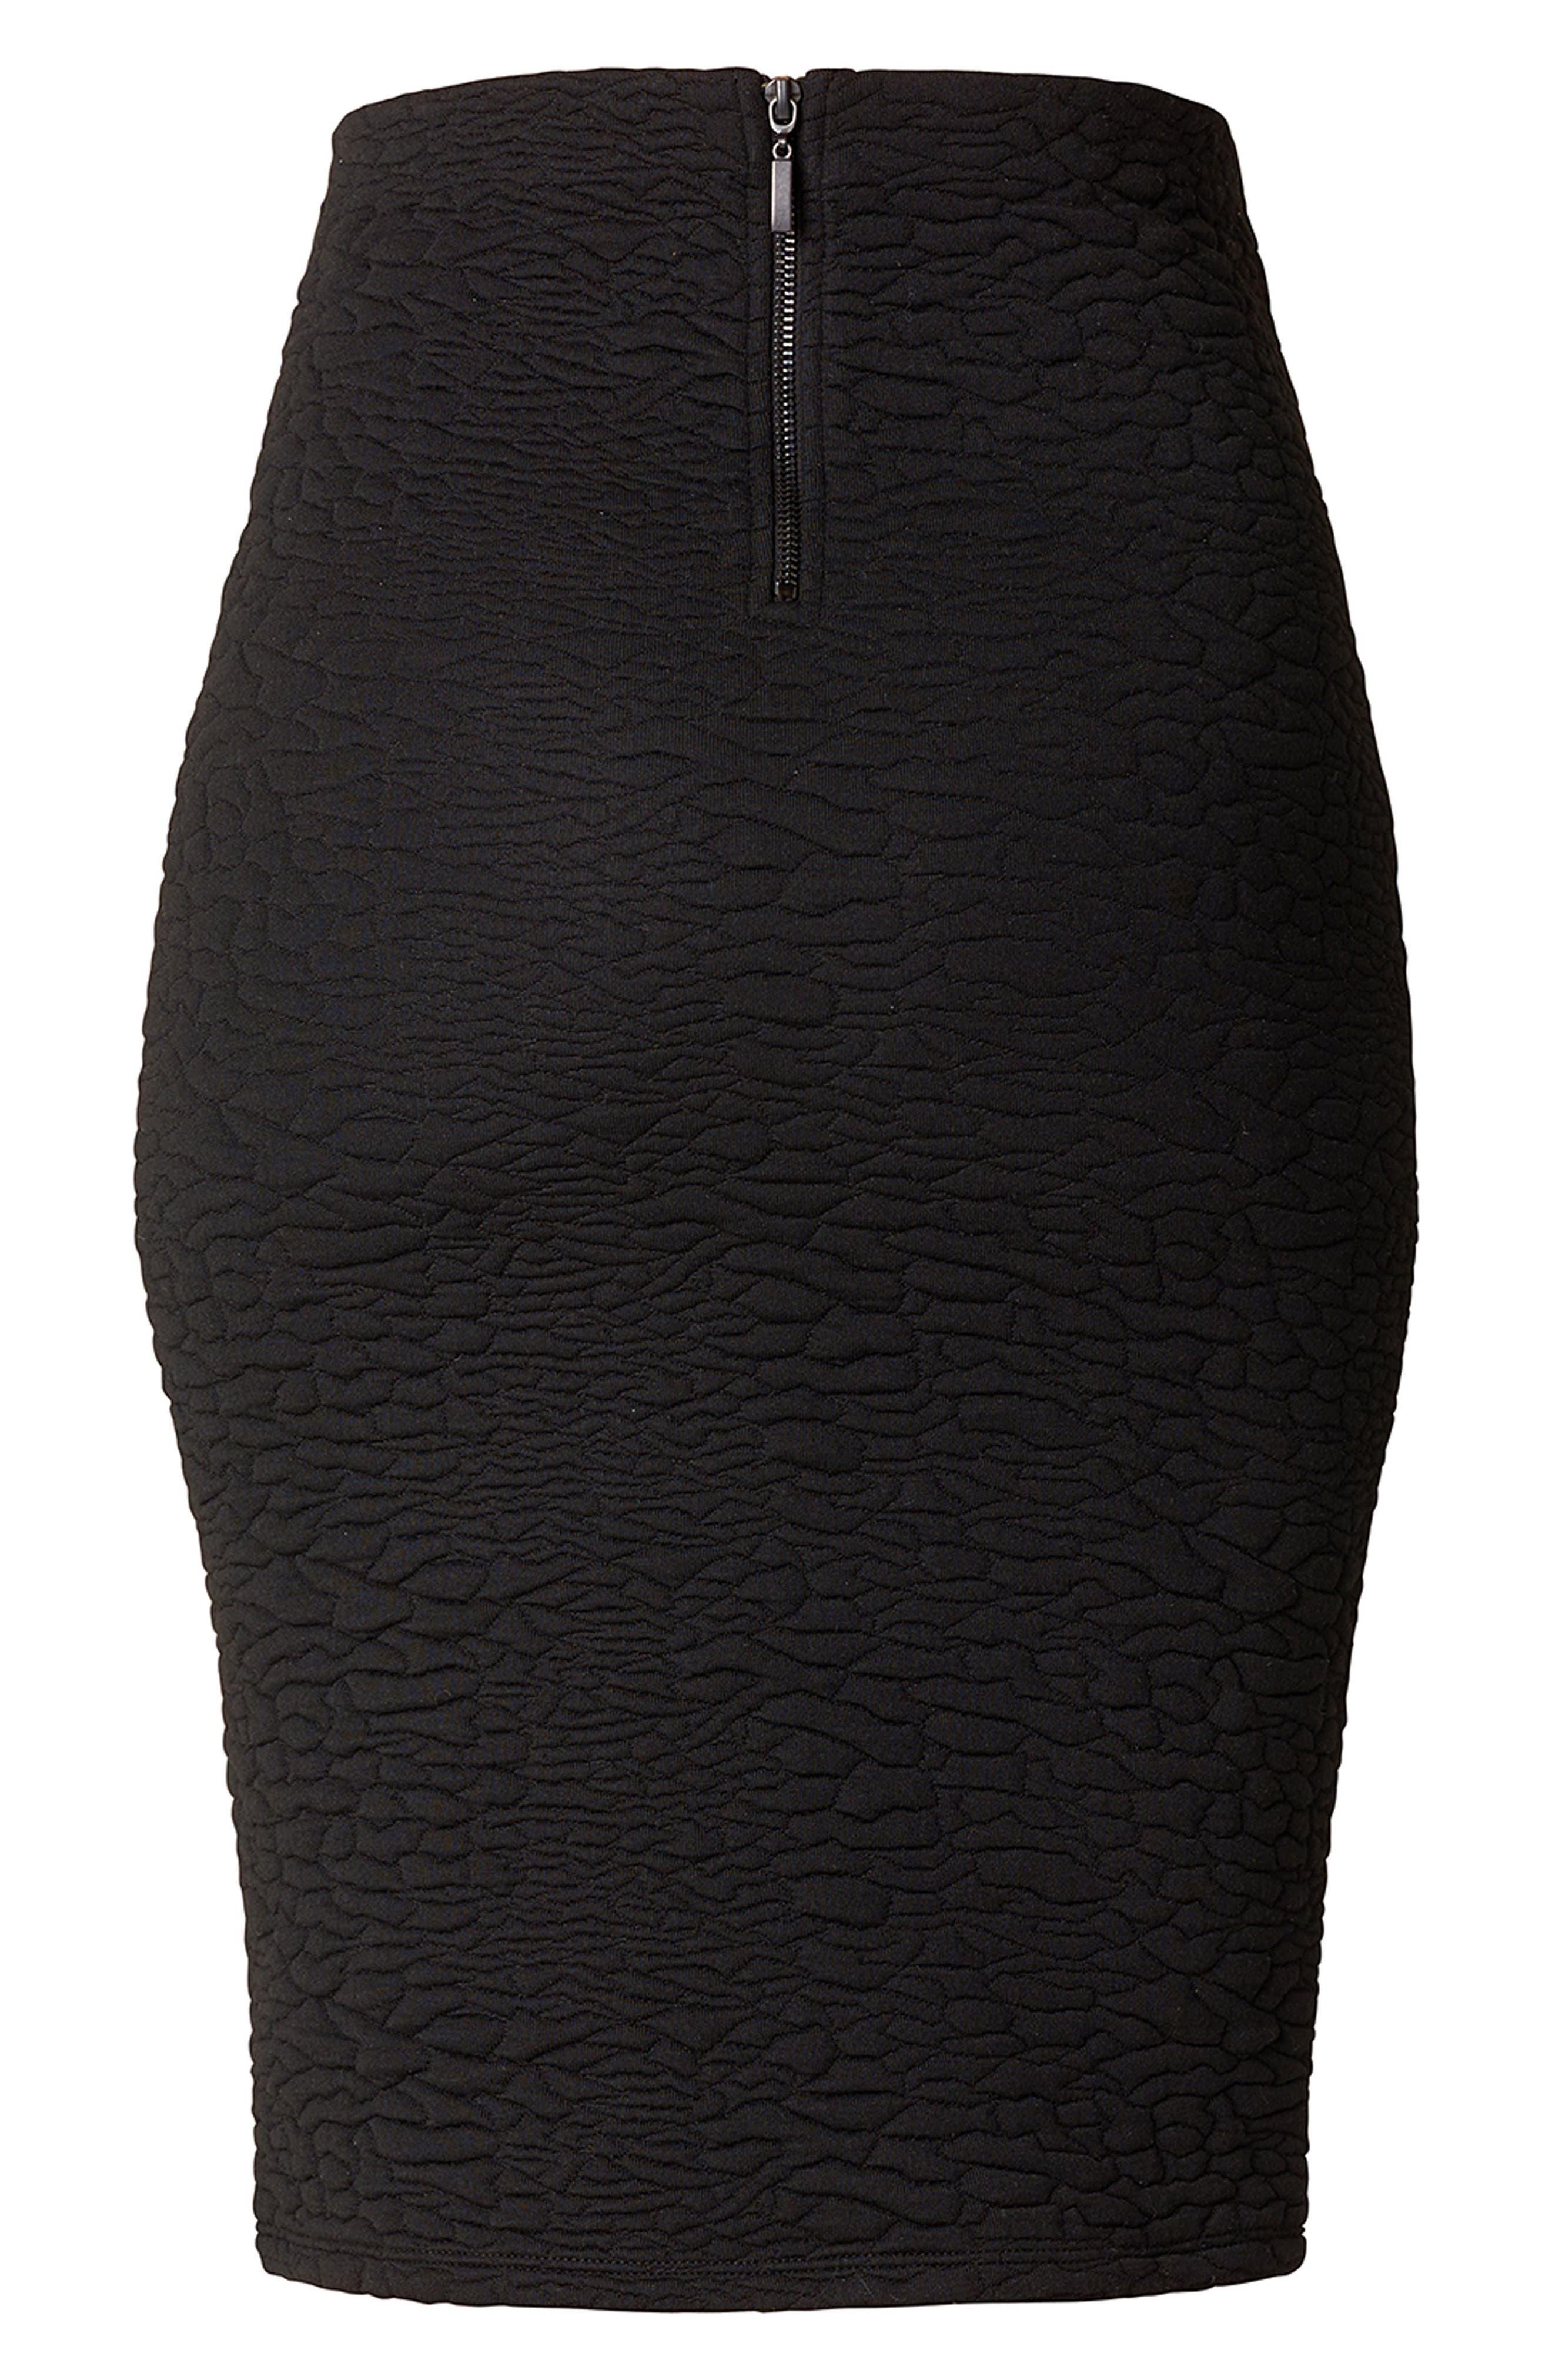 Alternate Image 3  - Noppies Jane Textured Knit Maternity Skirt